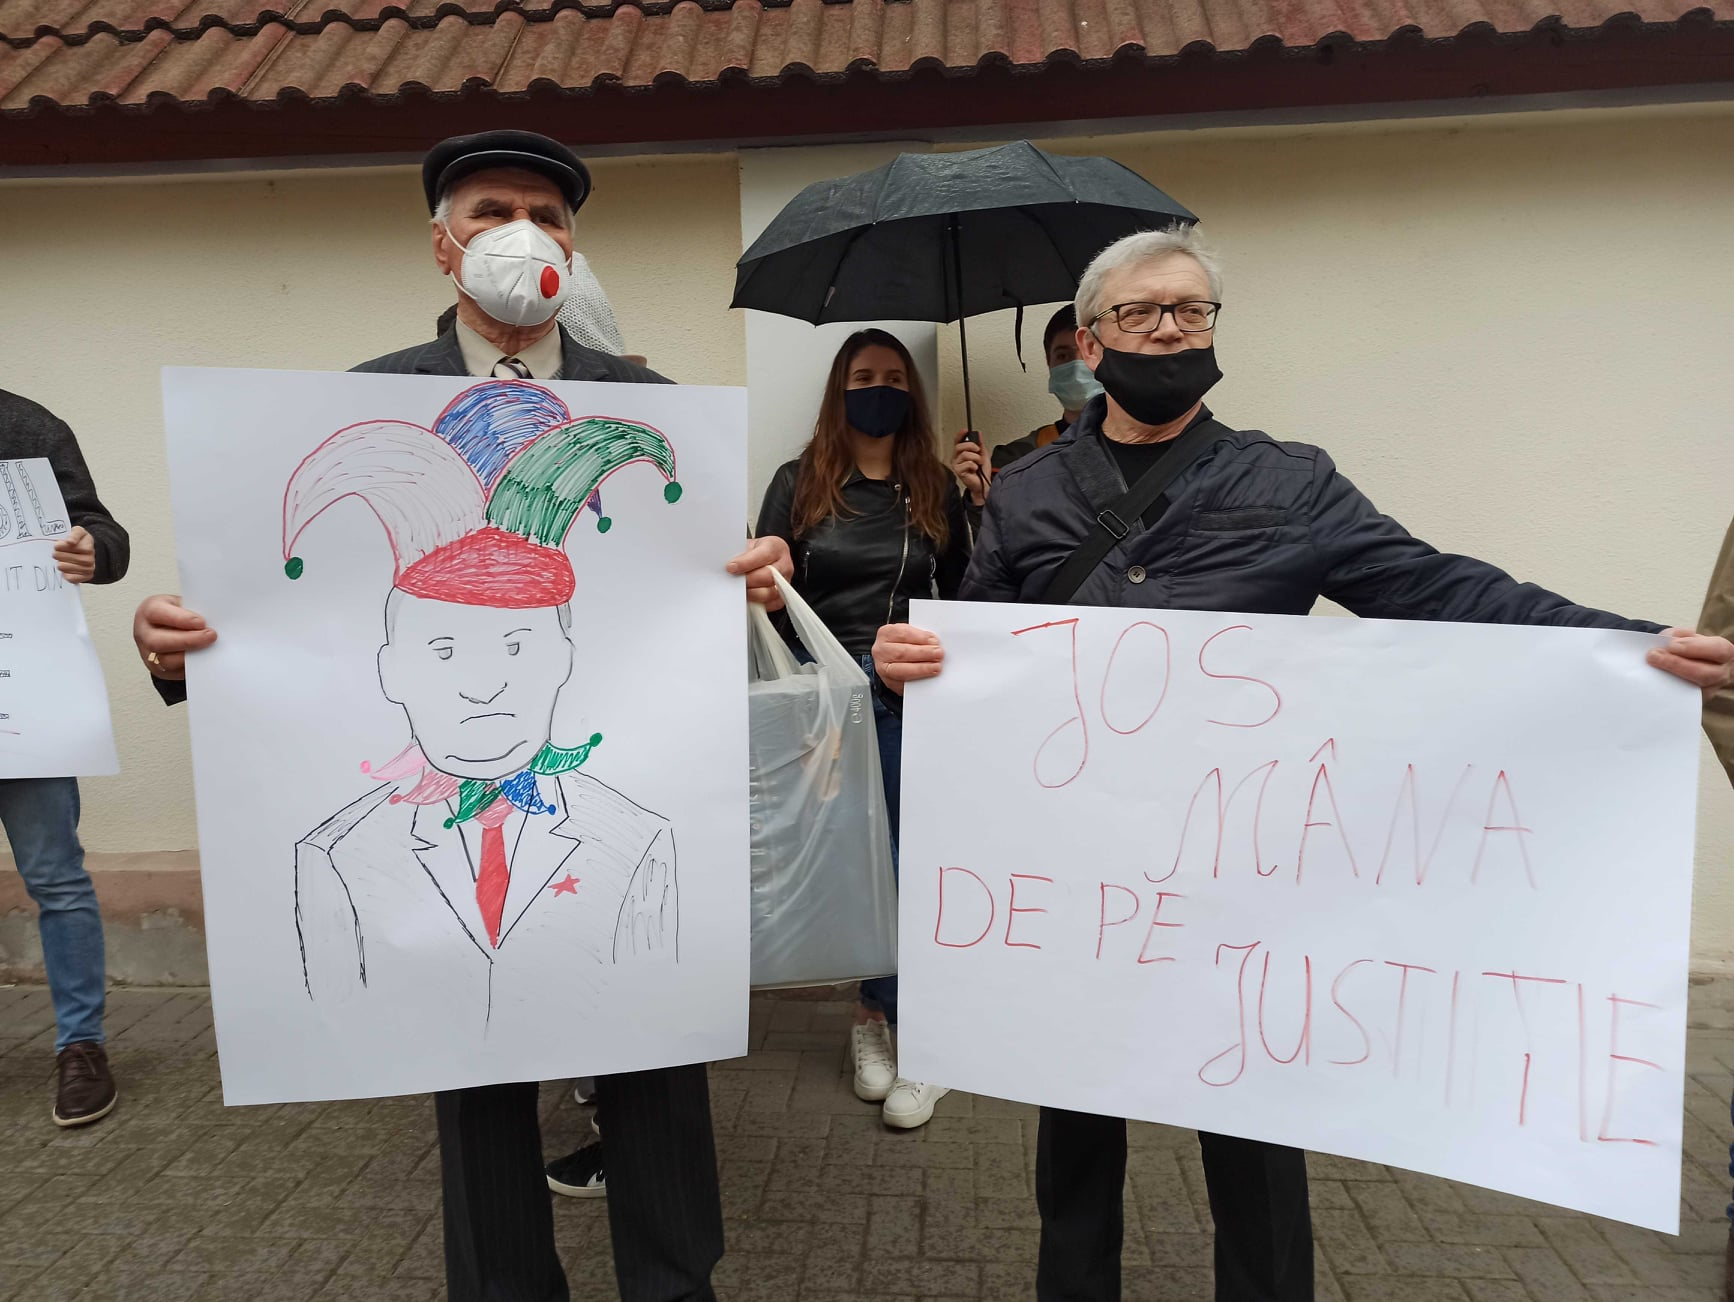 Протест у здания Конституционного суда. Стрим NM